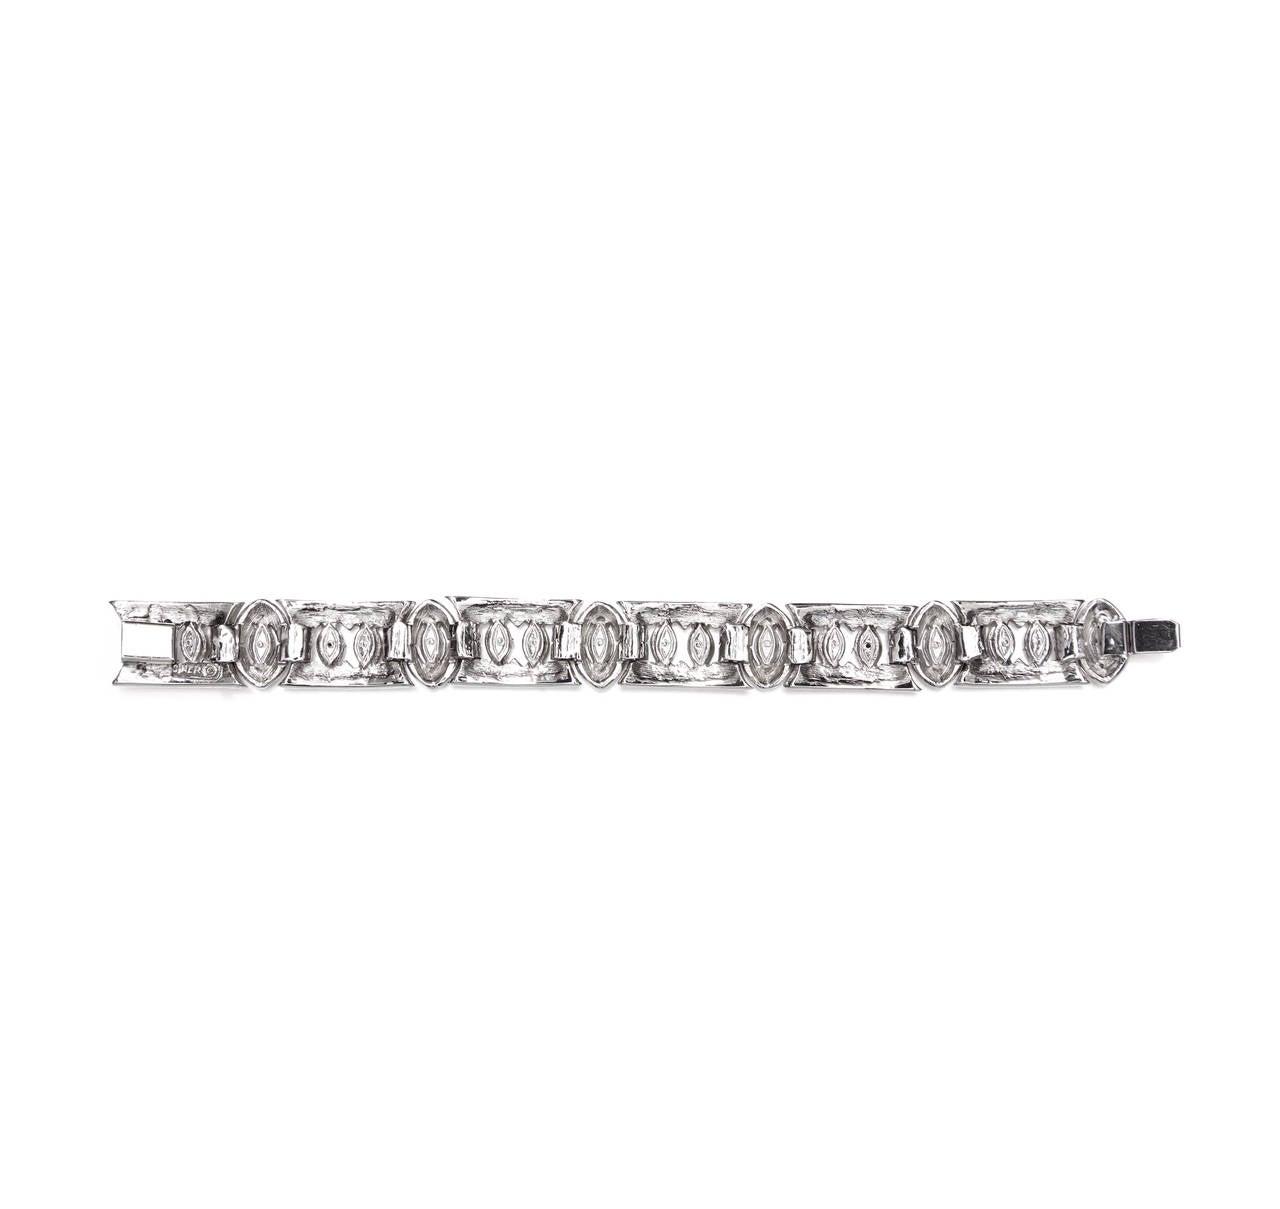 Vintage Ciner Art Deco Bracelet In Excellent Condition For Sale In London, GB